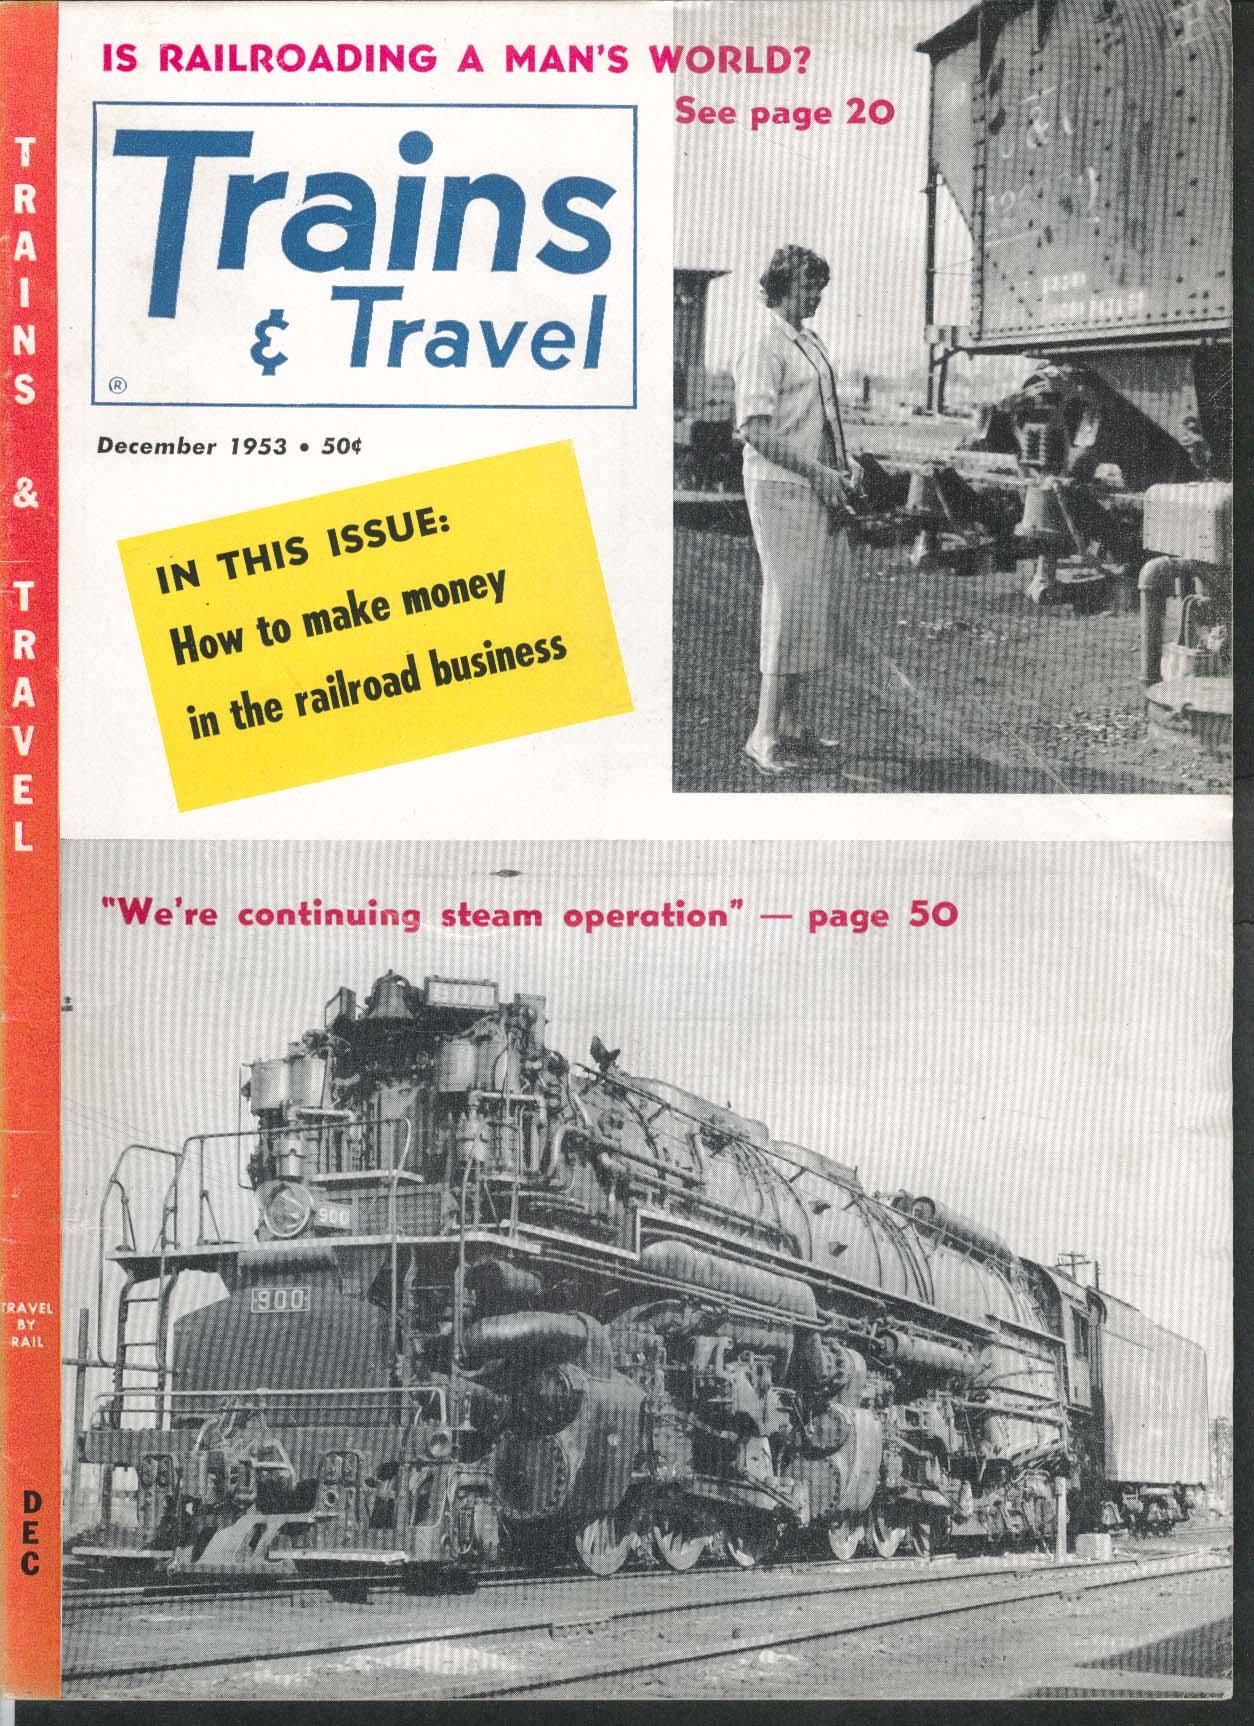 TRAINS & TRAVEL Passenger Veep Golden Age of Western Railroading 12 1953